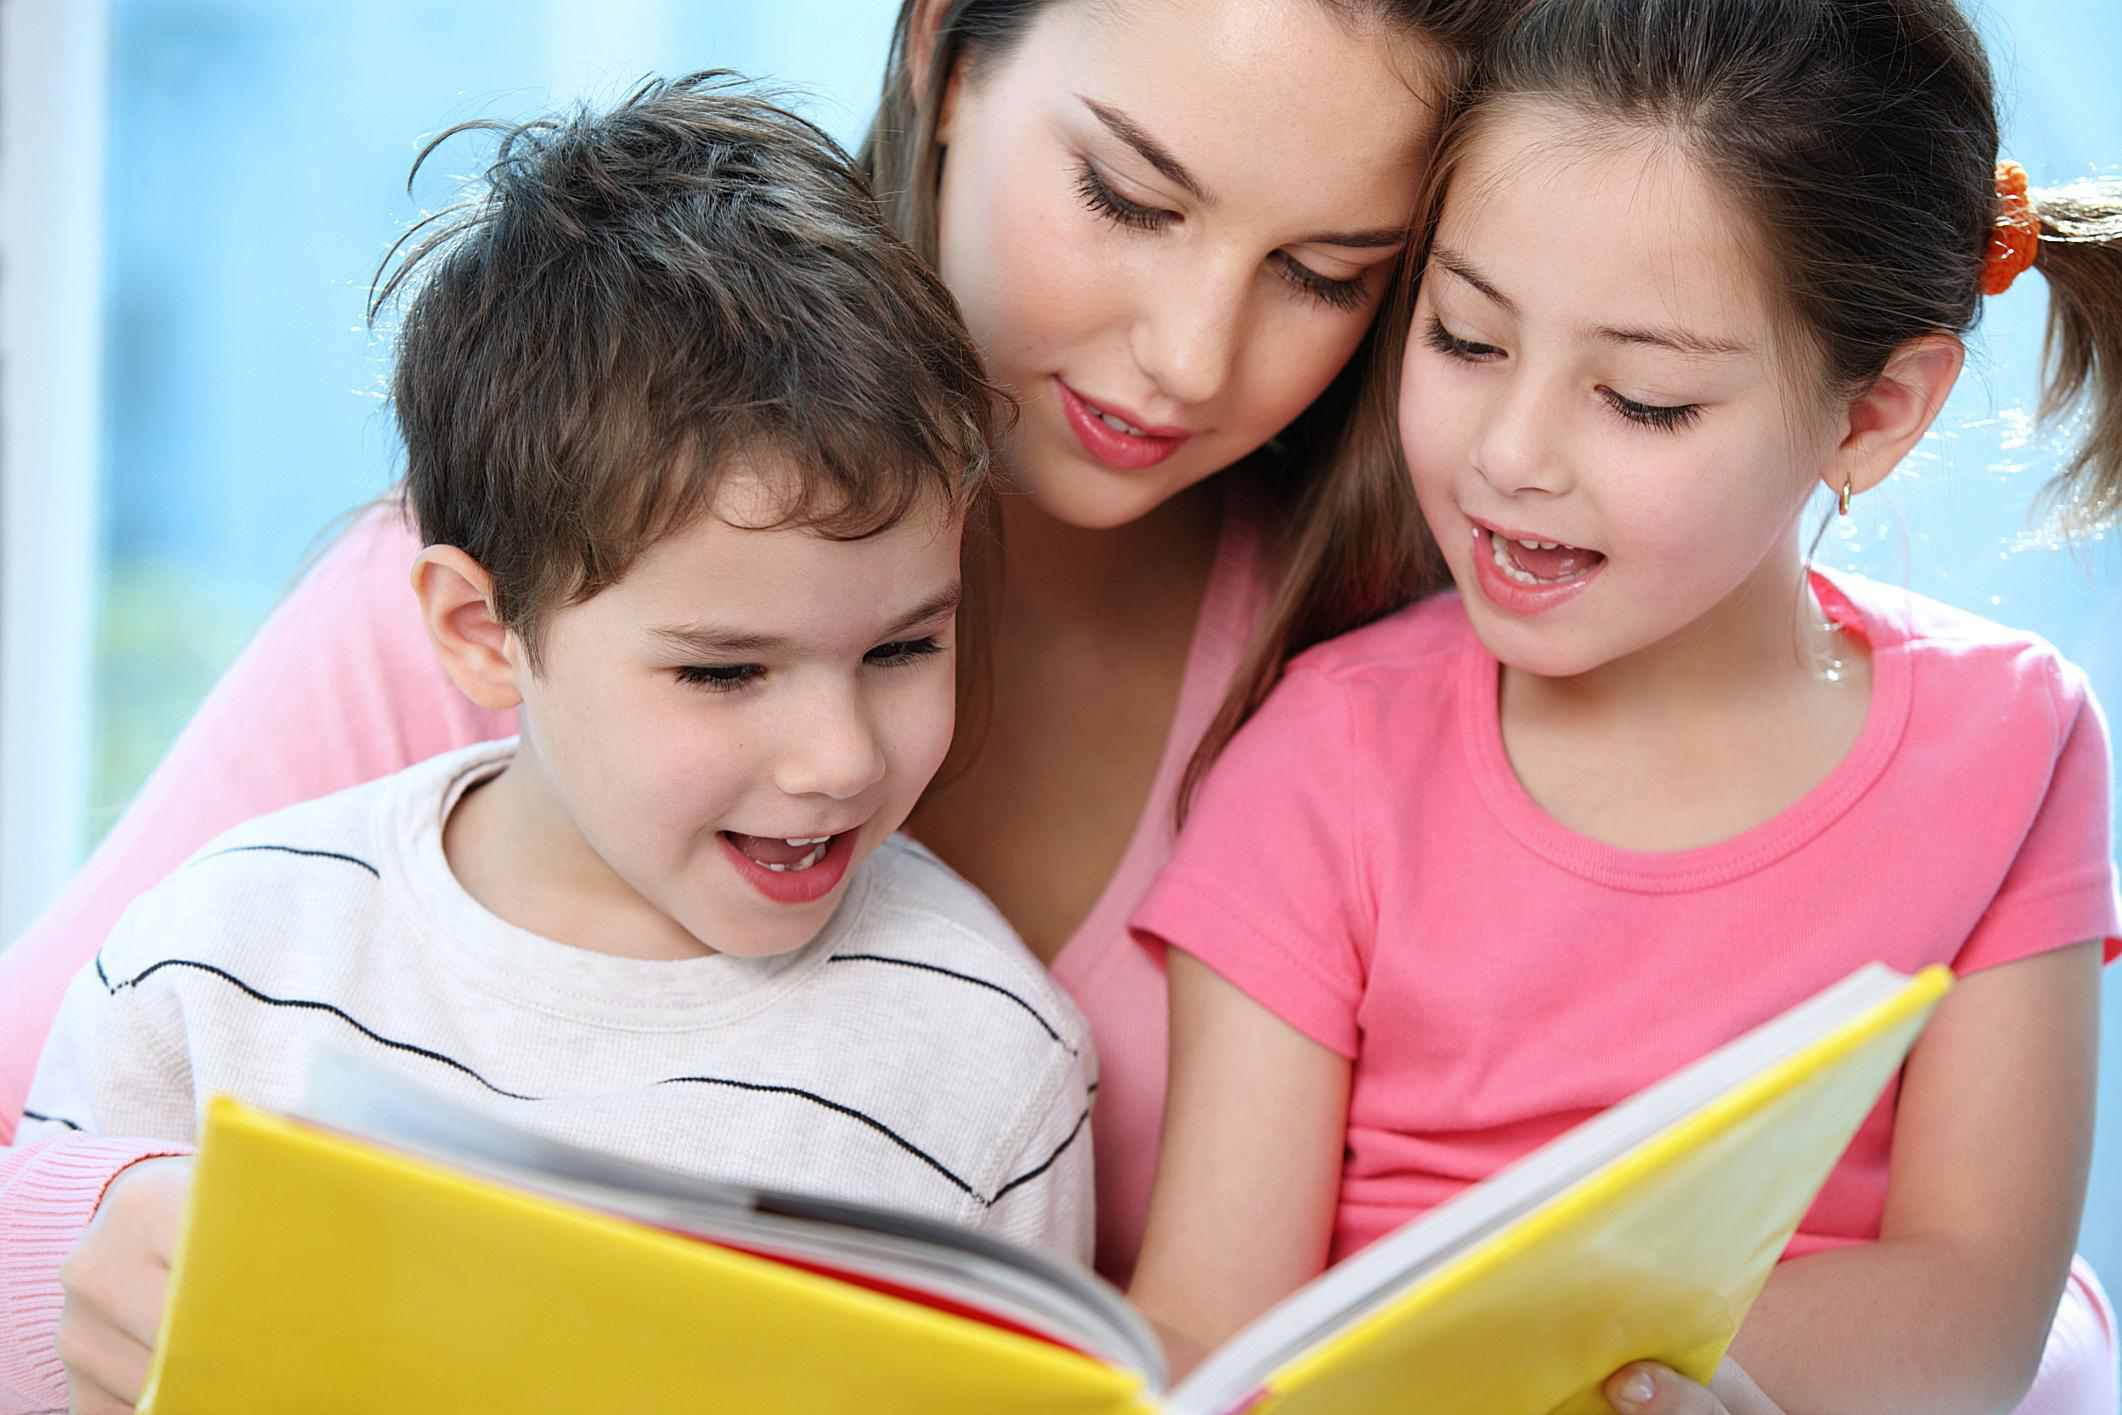 Niñera leyendo con niños